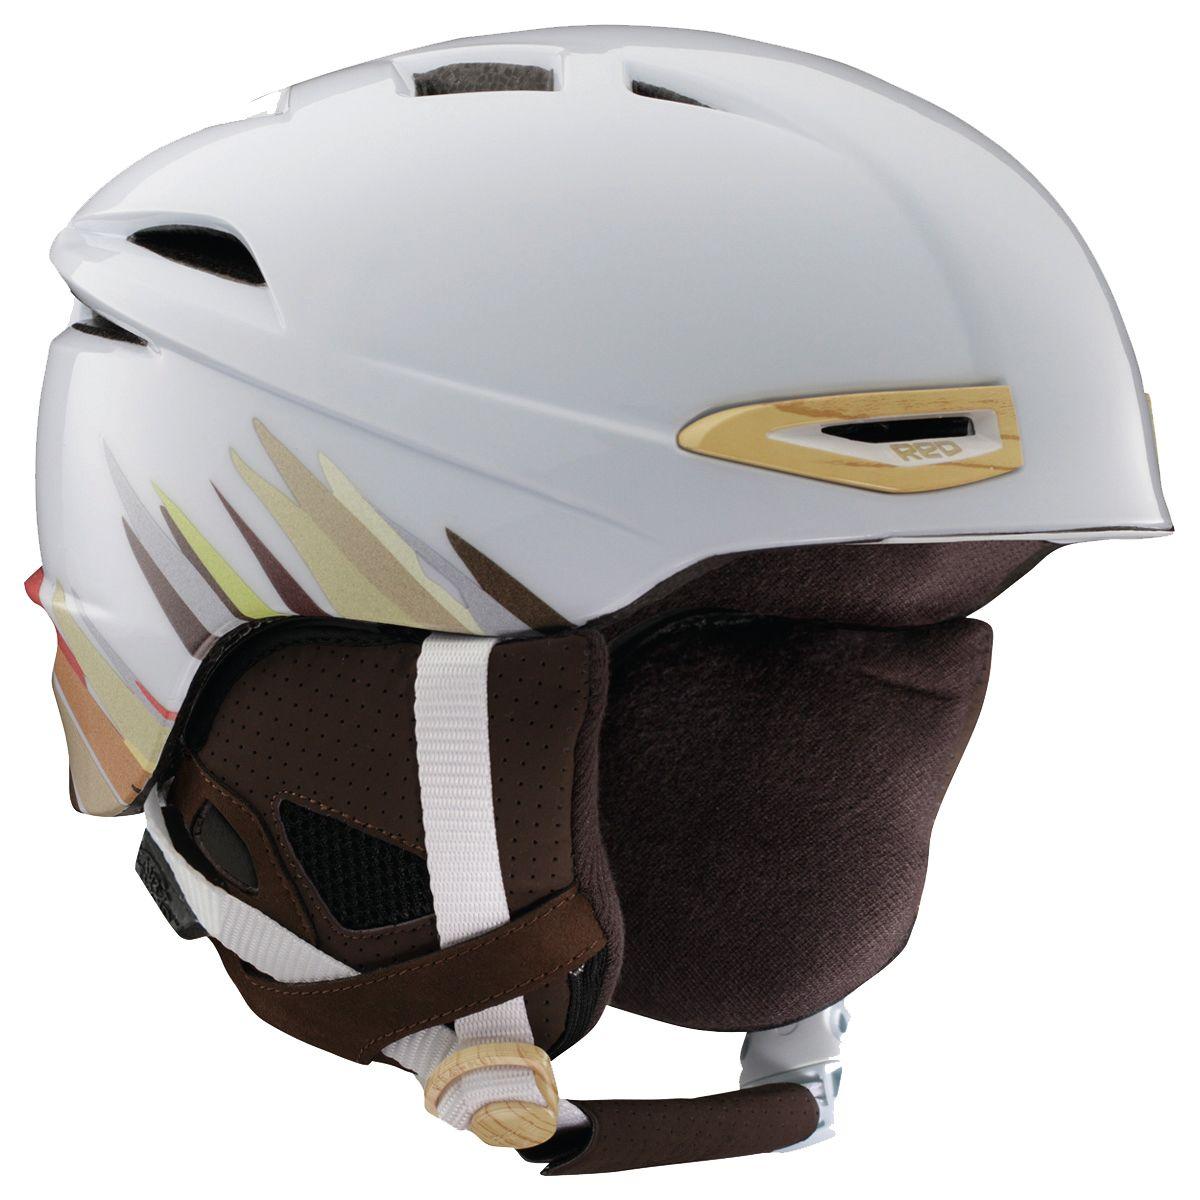 Cosu winter 2012 style helmet mbzdng